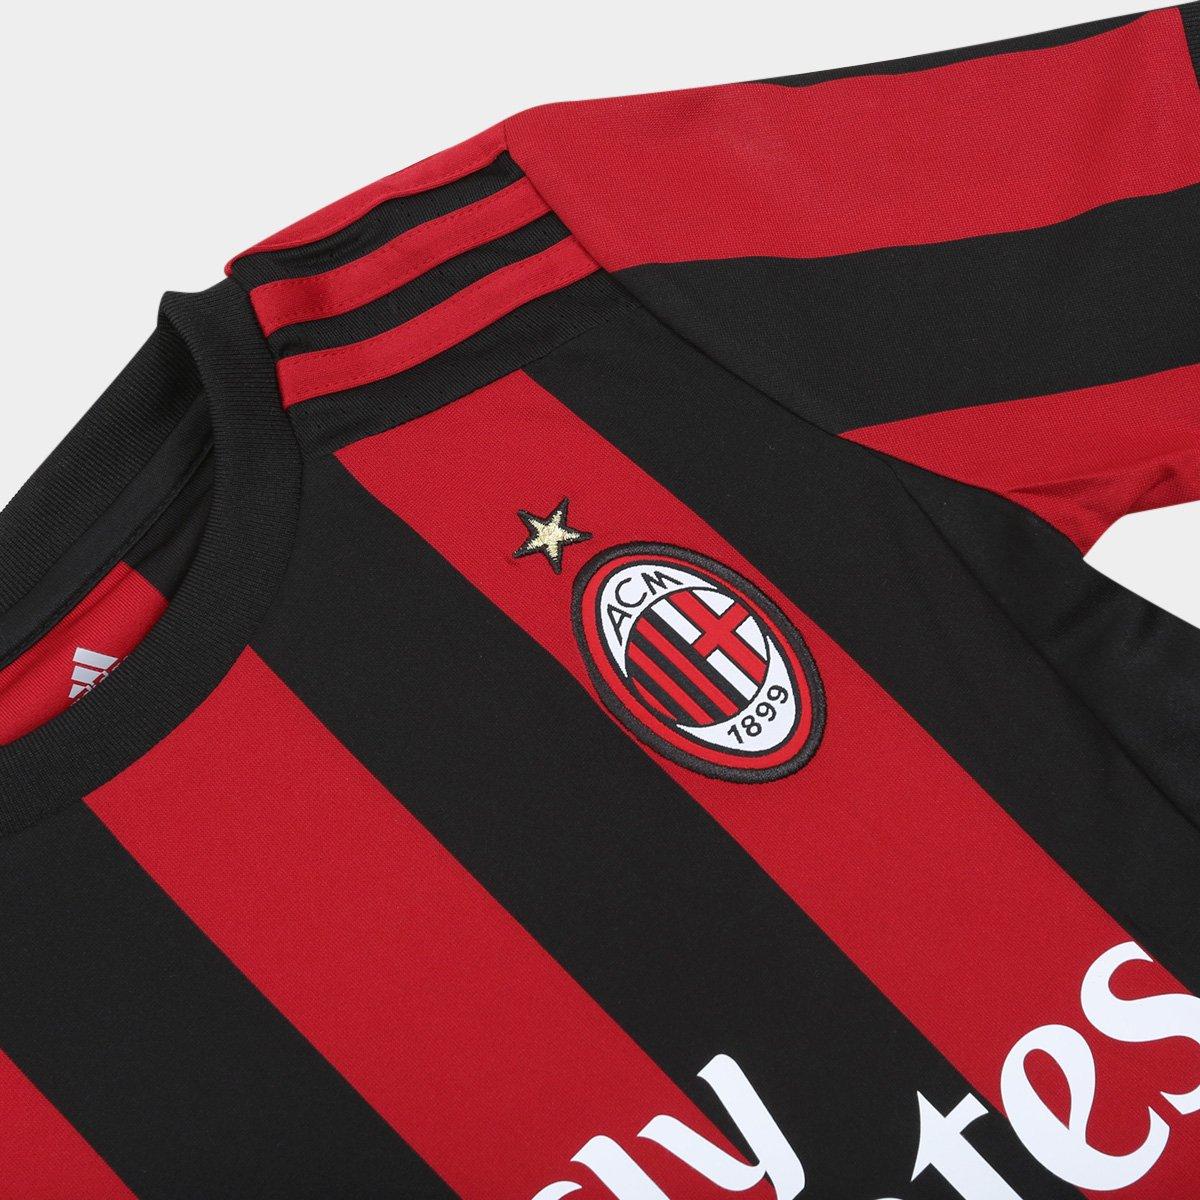 Camisa Milan Infantil Home 17 18 s nº - Torcedor Adidas - Compre ... 8d4f1a3072adf